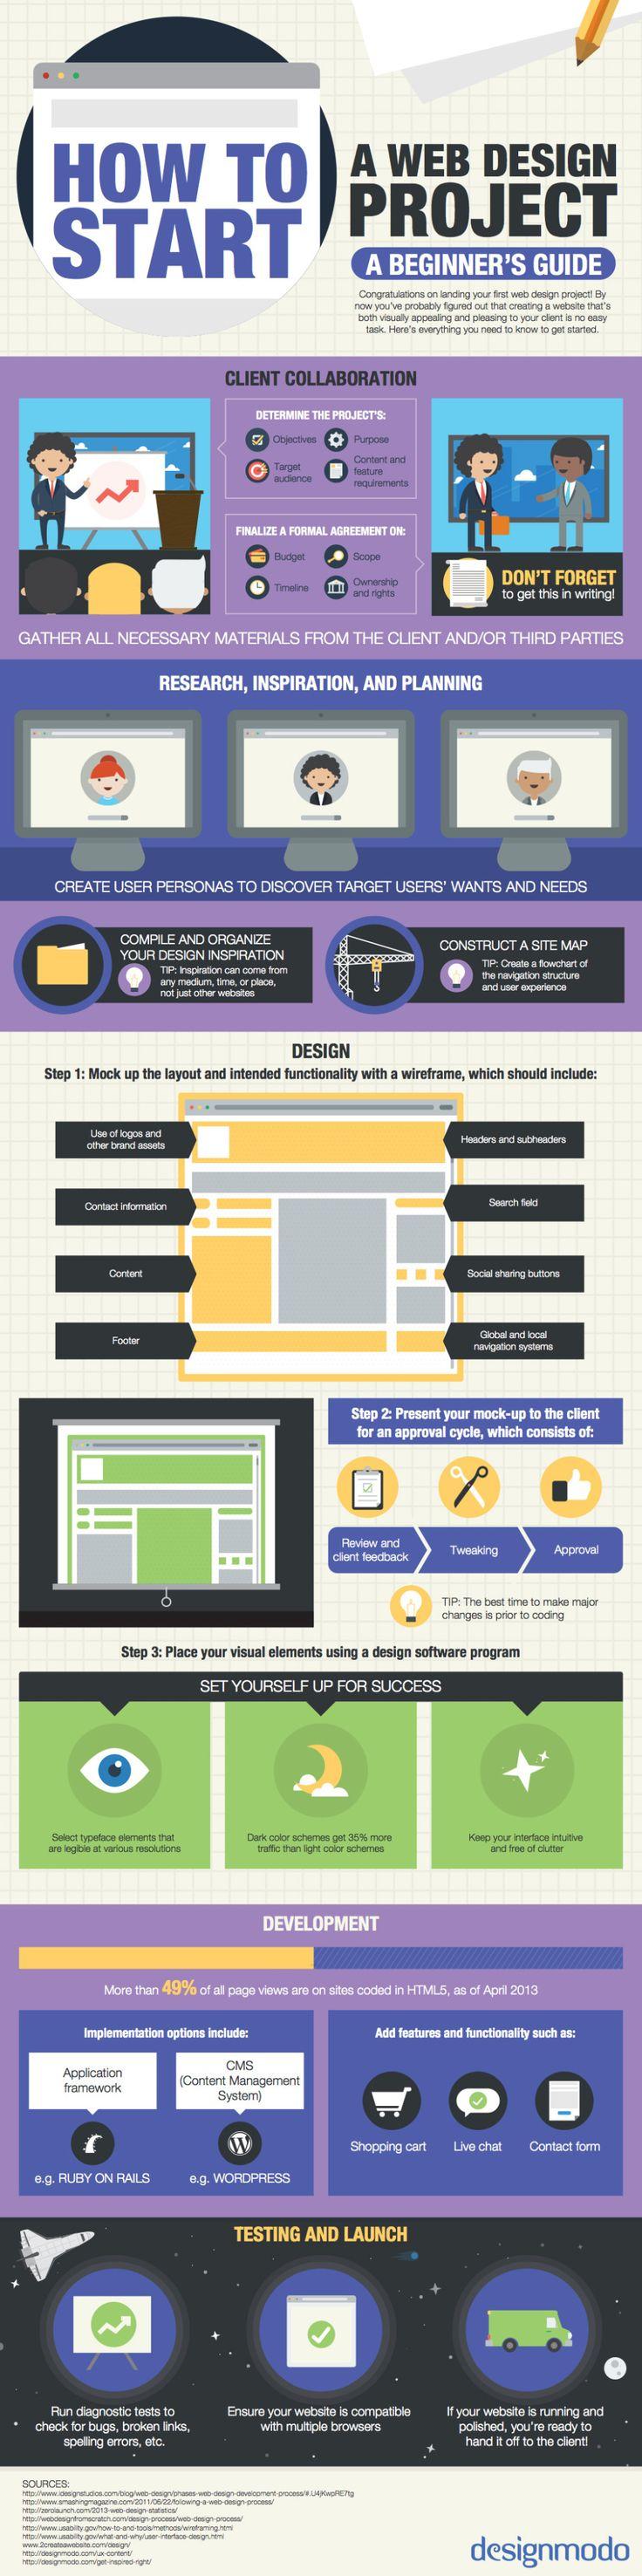 How To Start A Web Design Project | Infographic #coriate #webdesign #webdevelopment